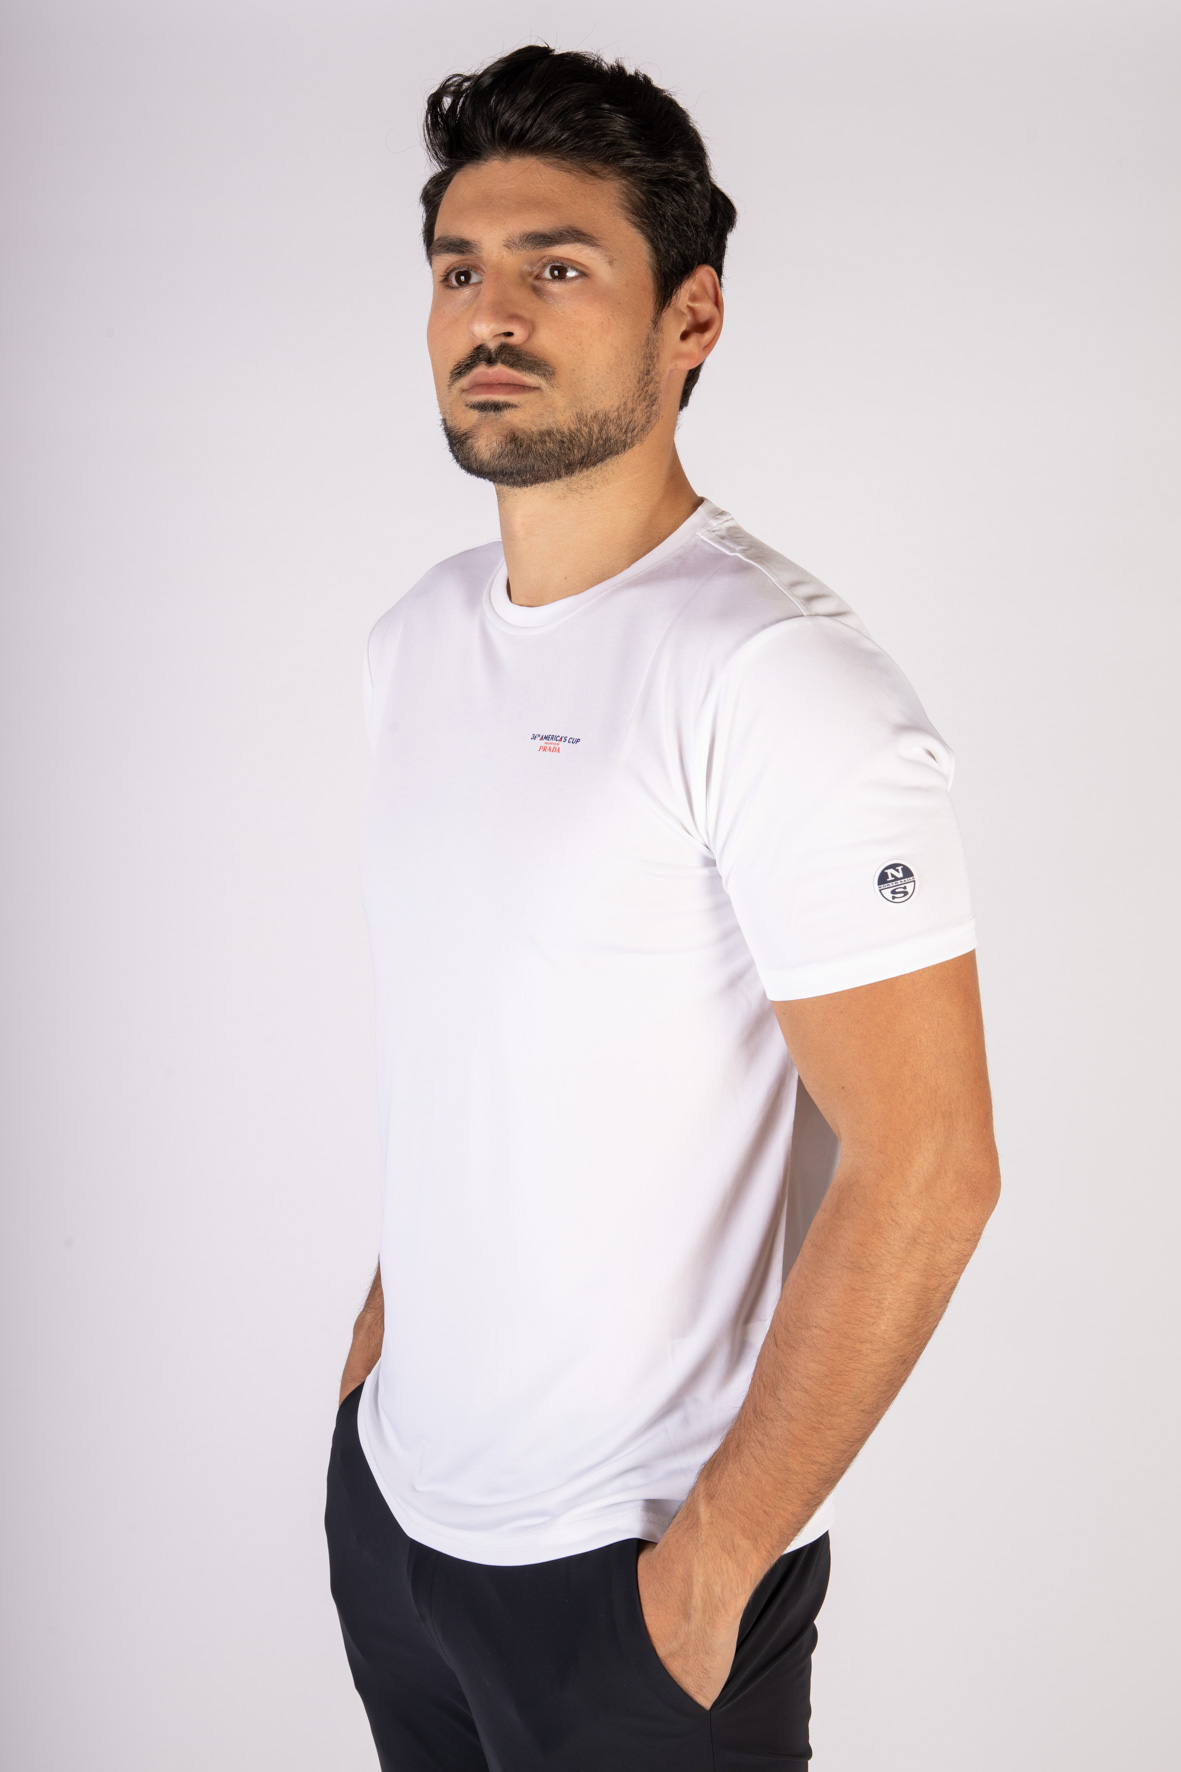 T-SHIRT AMERICA'S CUP NORTH SAILS | T-shirt | 4523070101